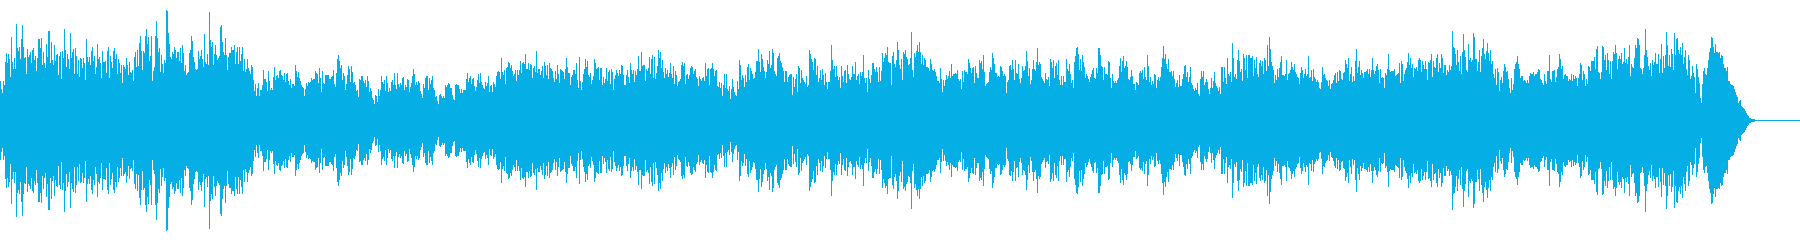 RV356_1『アレグロ』ヴィヴァルディの再生済みの波形